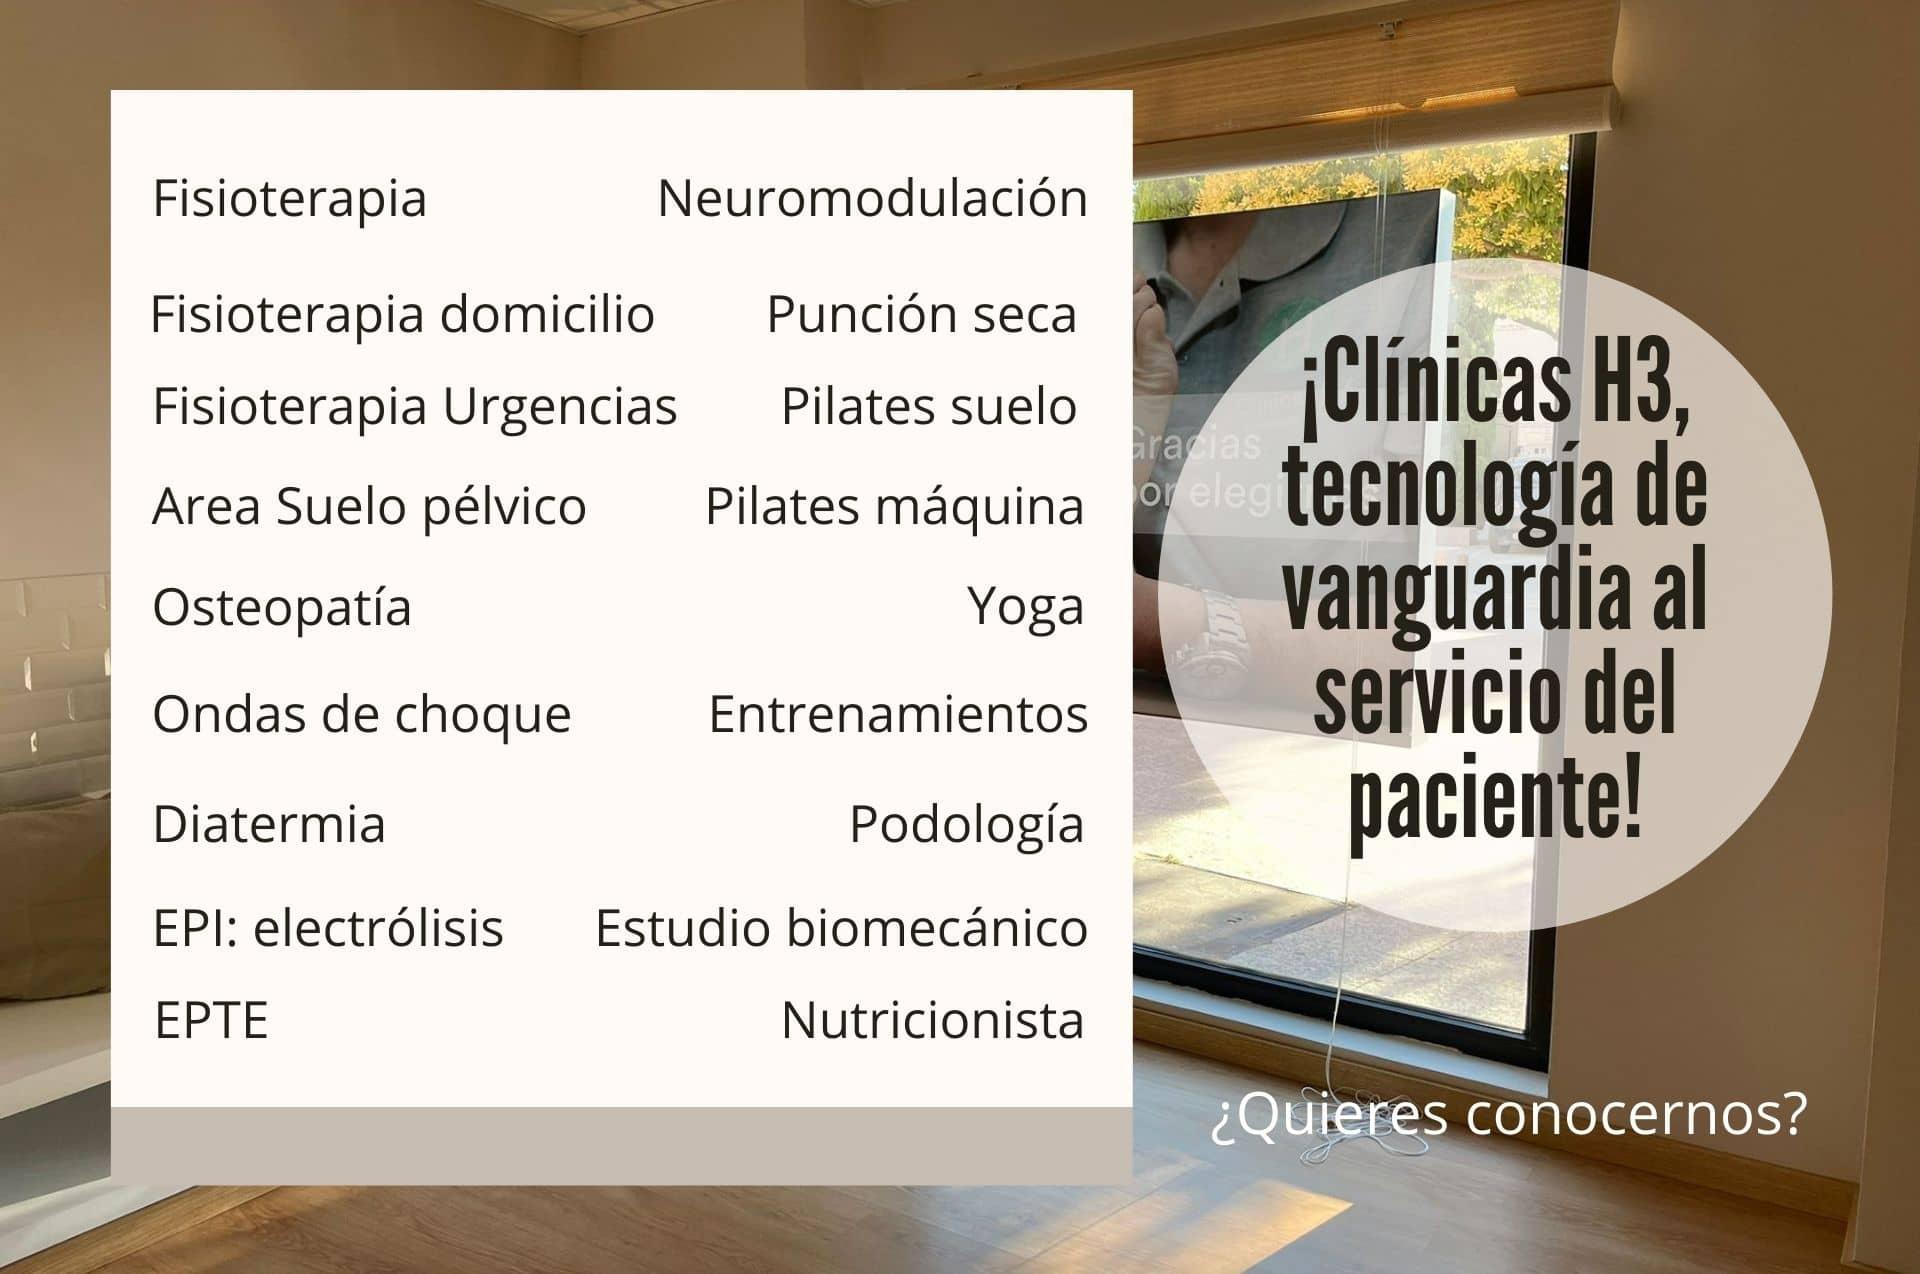 Mejor clinica fisioterapia Madrid. Clínicas H3